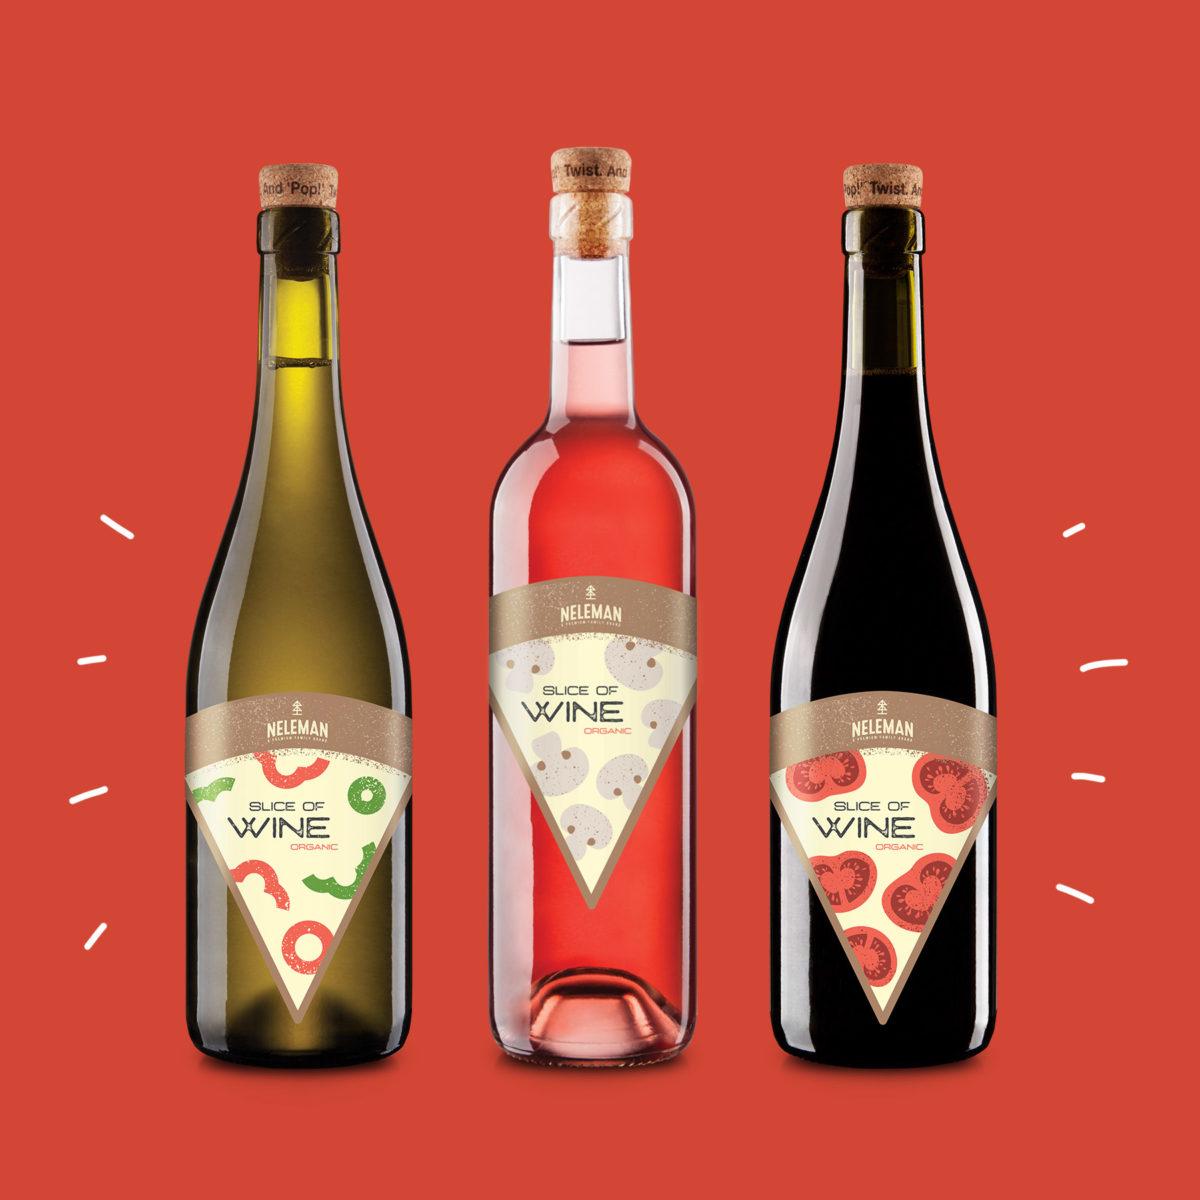 Slice-of-wine_Luksemburk_02_favourite